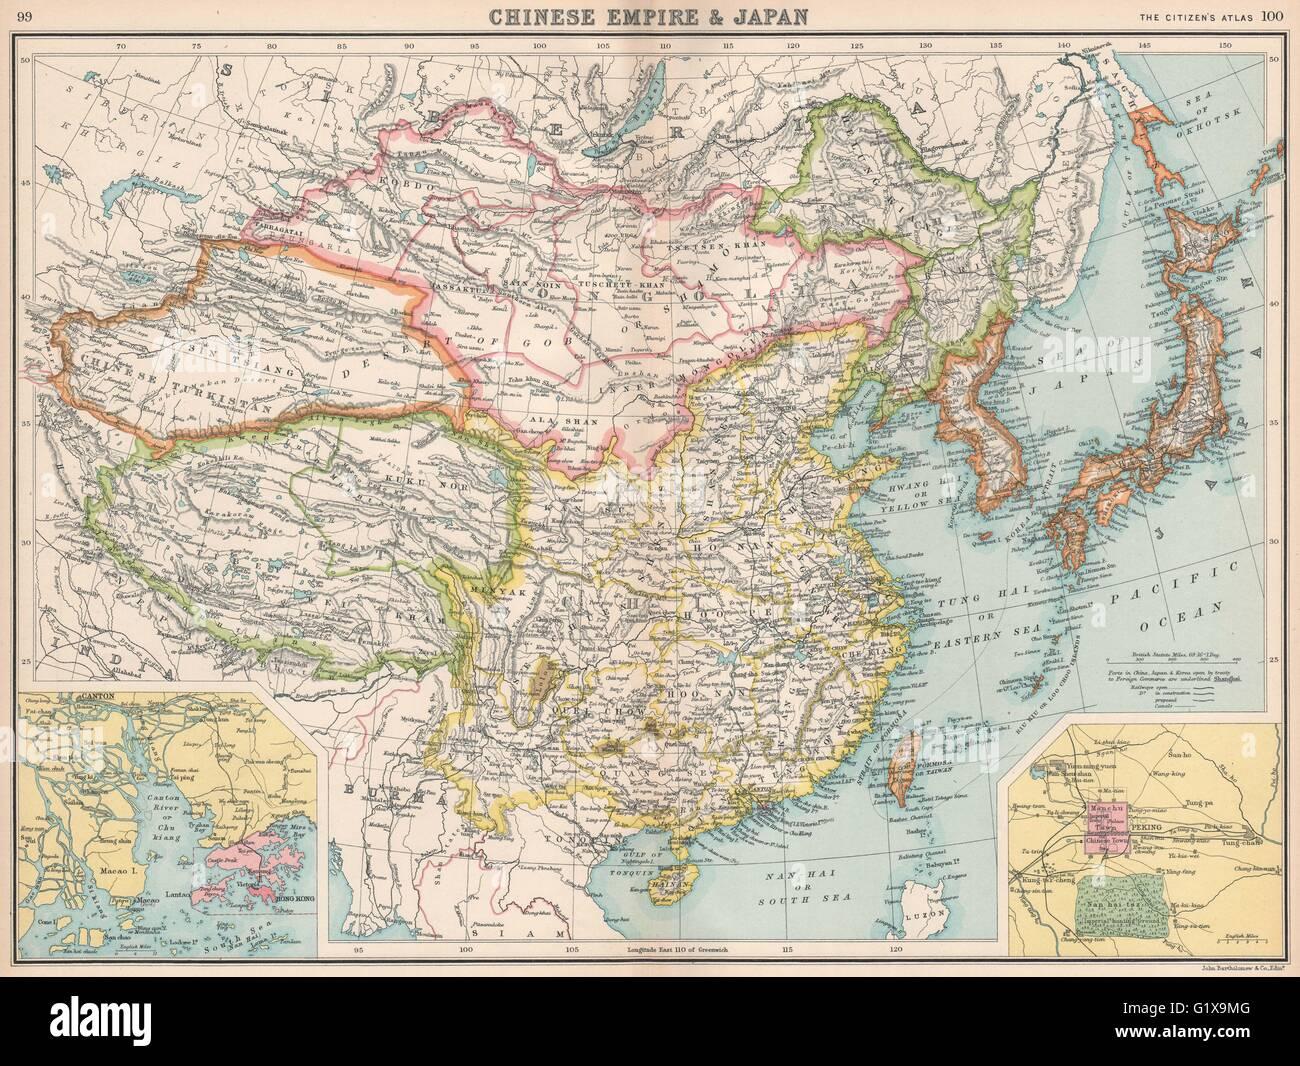 East asia china chinese turkistan tibet korea japan hong kong stock east asia china chinese turkistan tibet korea japan hong kong peking 1912 map gumiabroncs Image collections